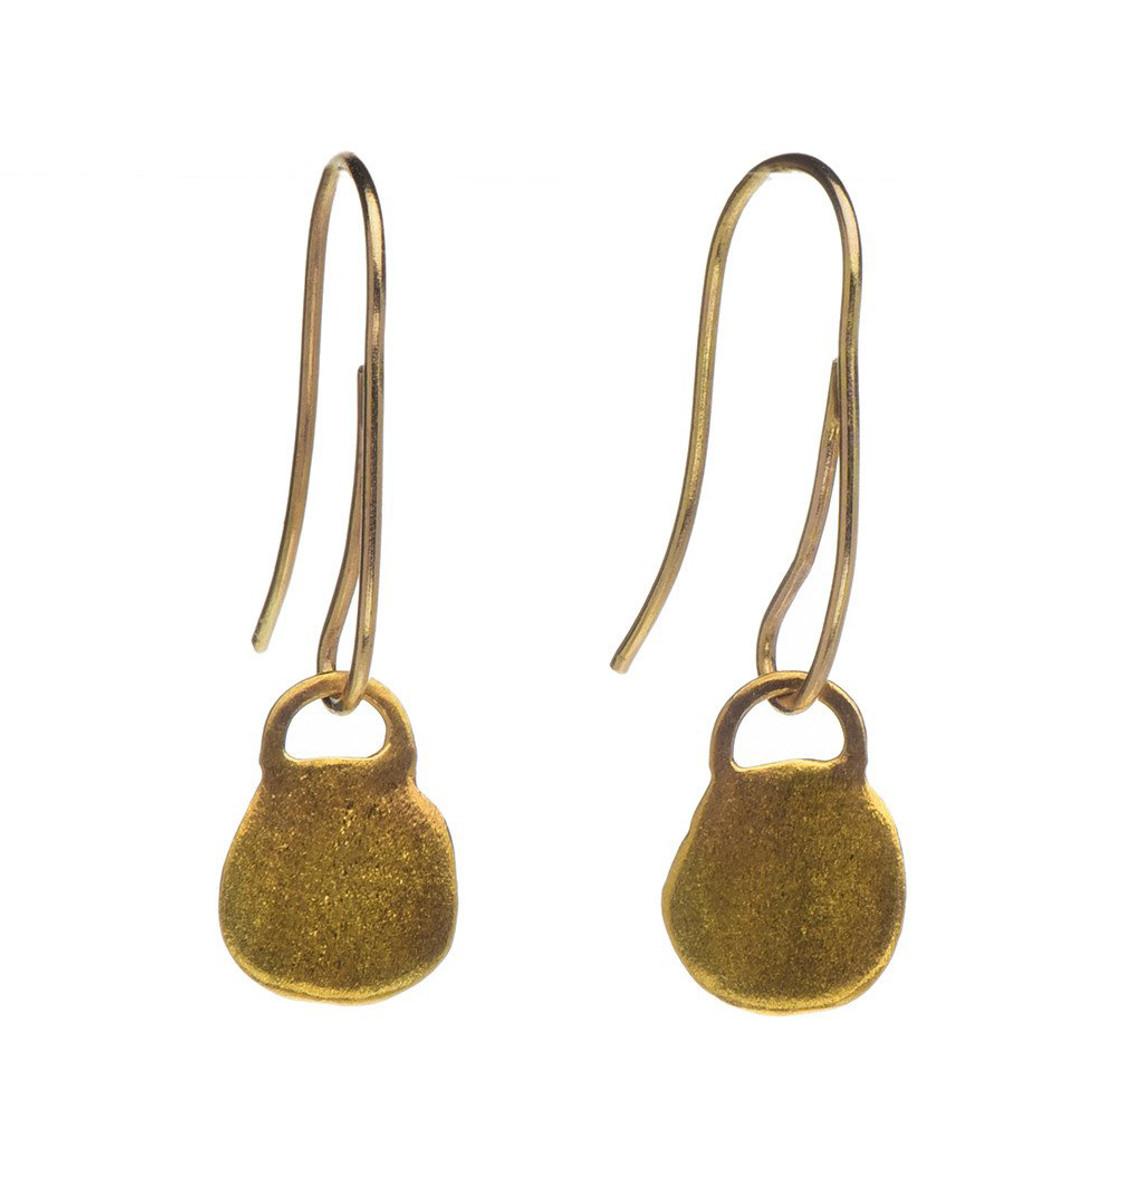 Lock of Gold Earrings - New Arrival